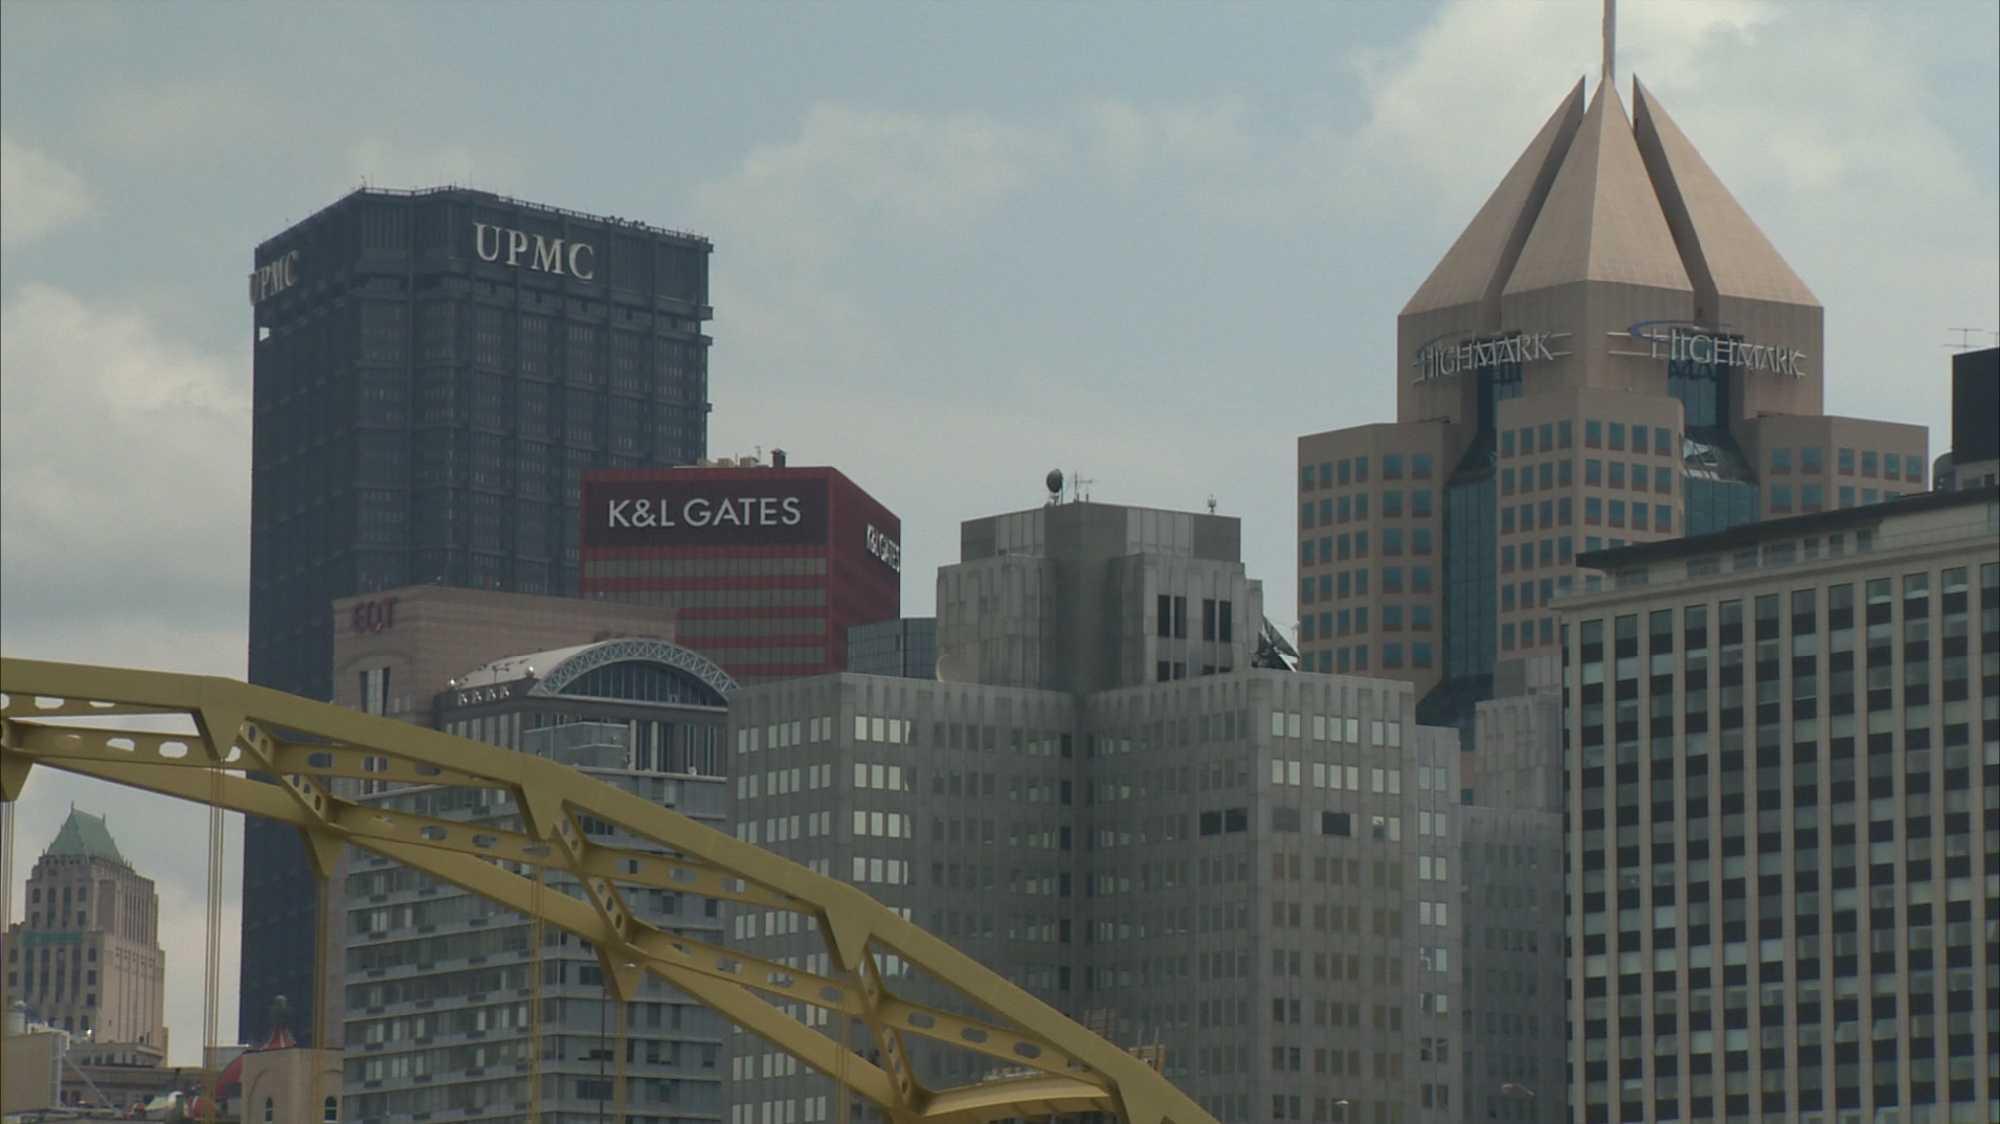 Downtown skyline, K&L Gates, UPMC, Highmark building